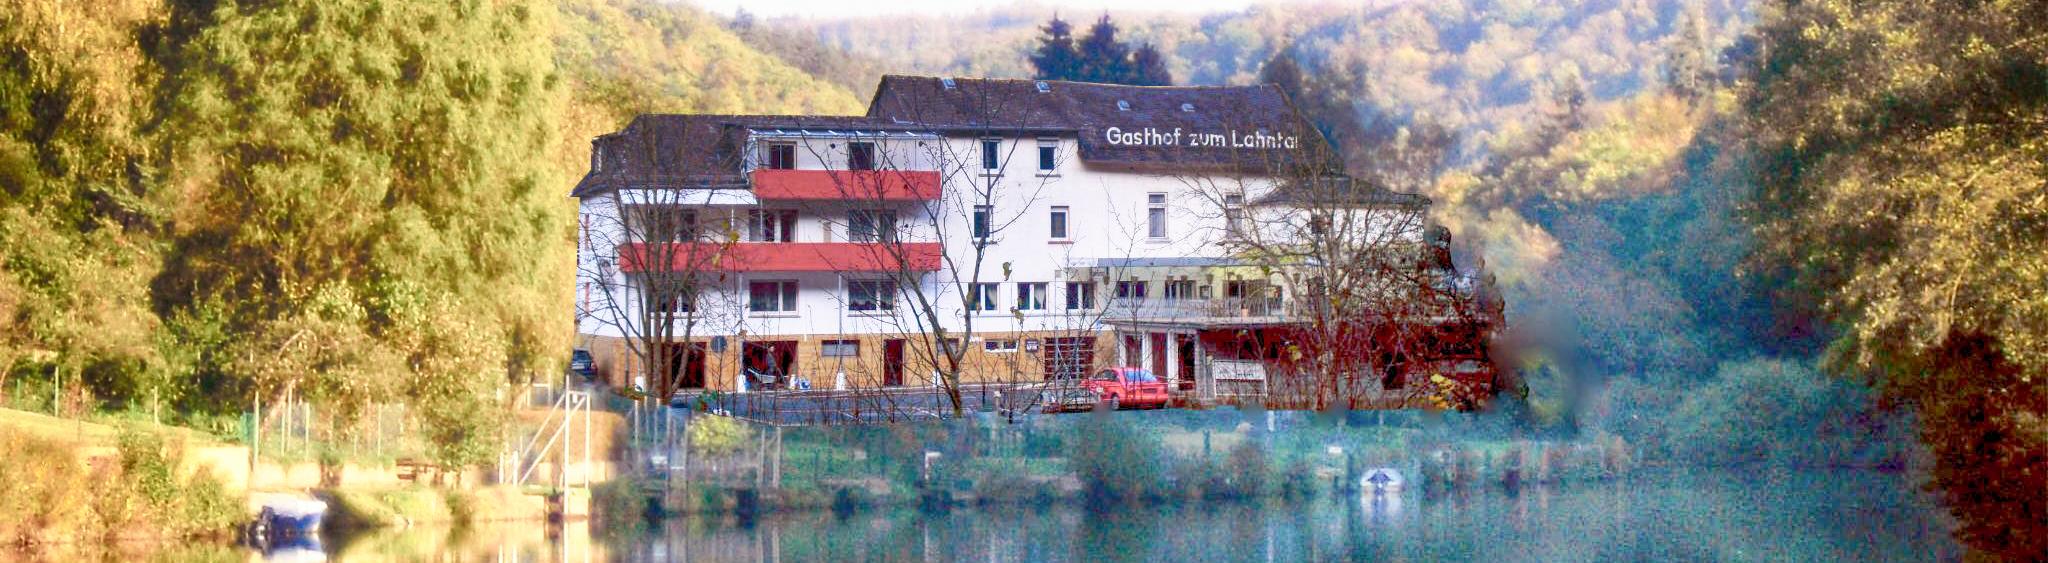 Hotel und Gasthof Lahntal